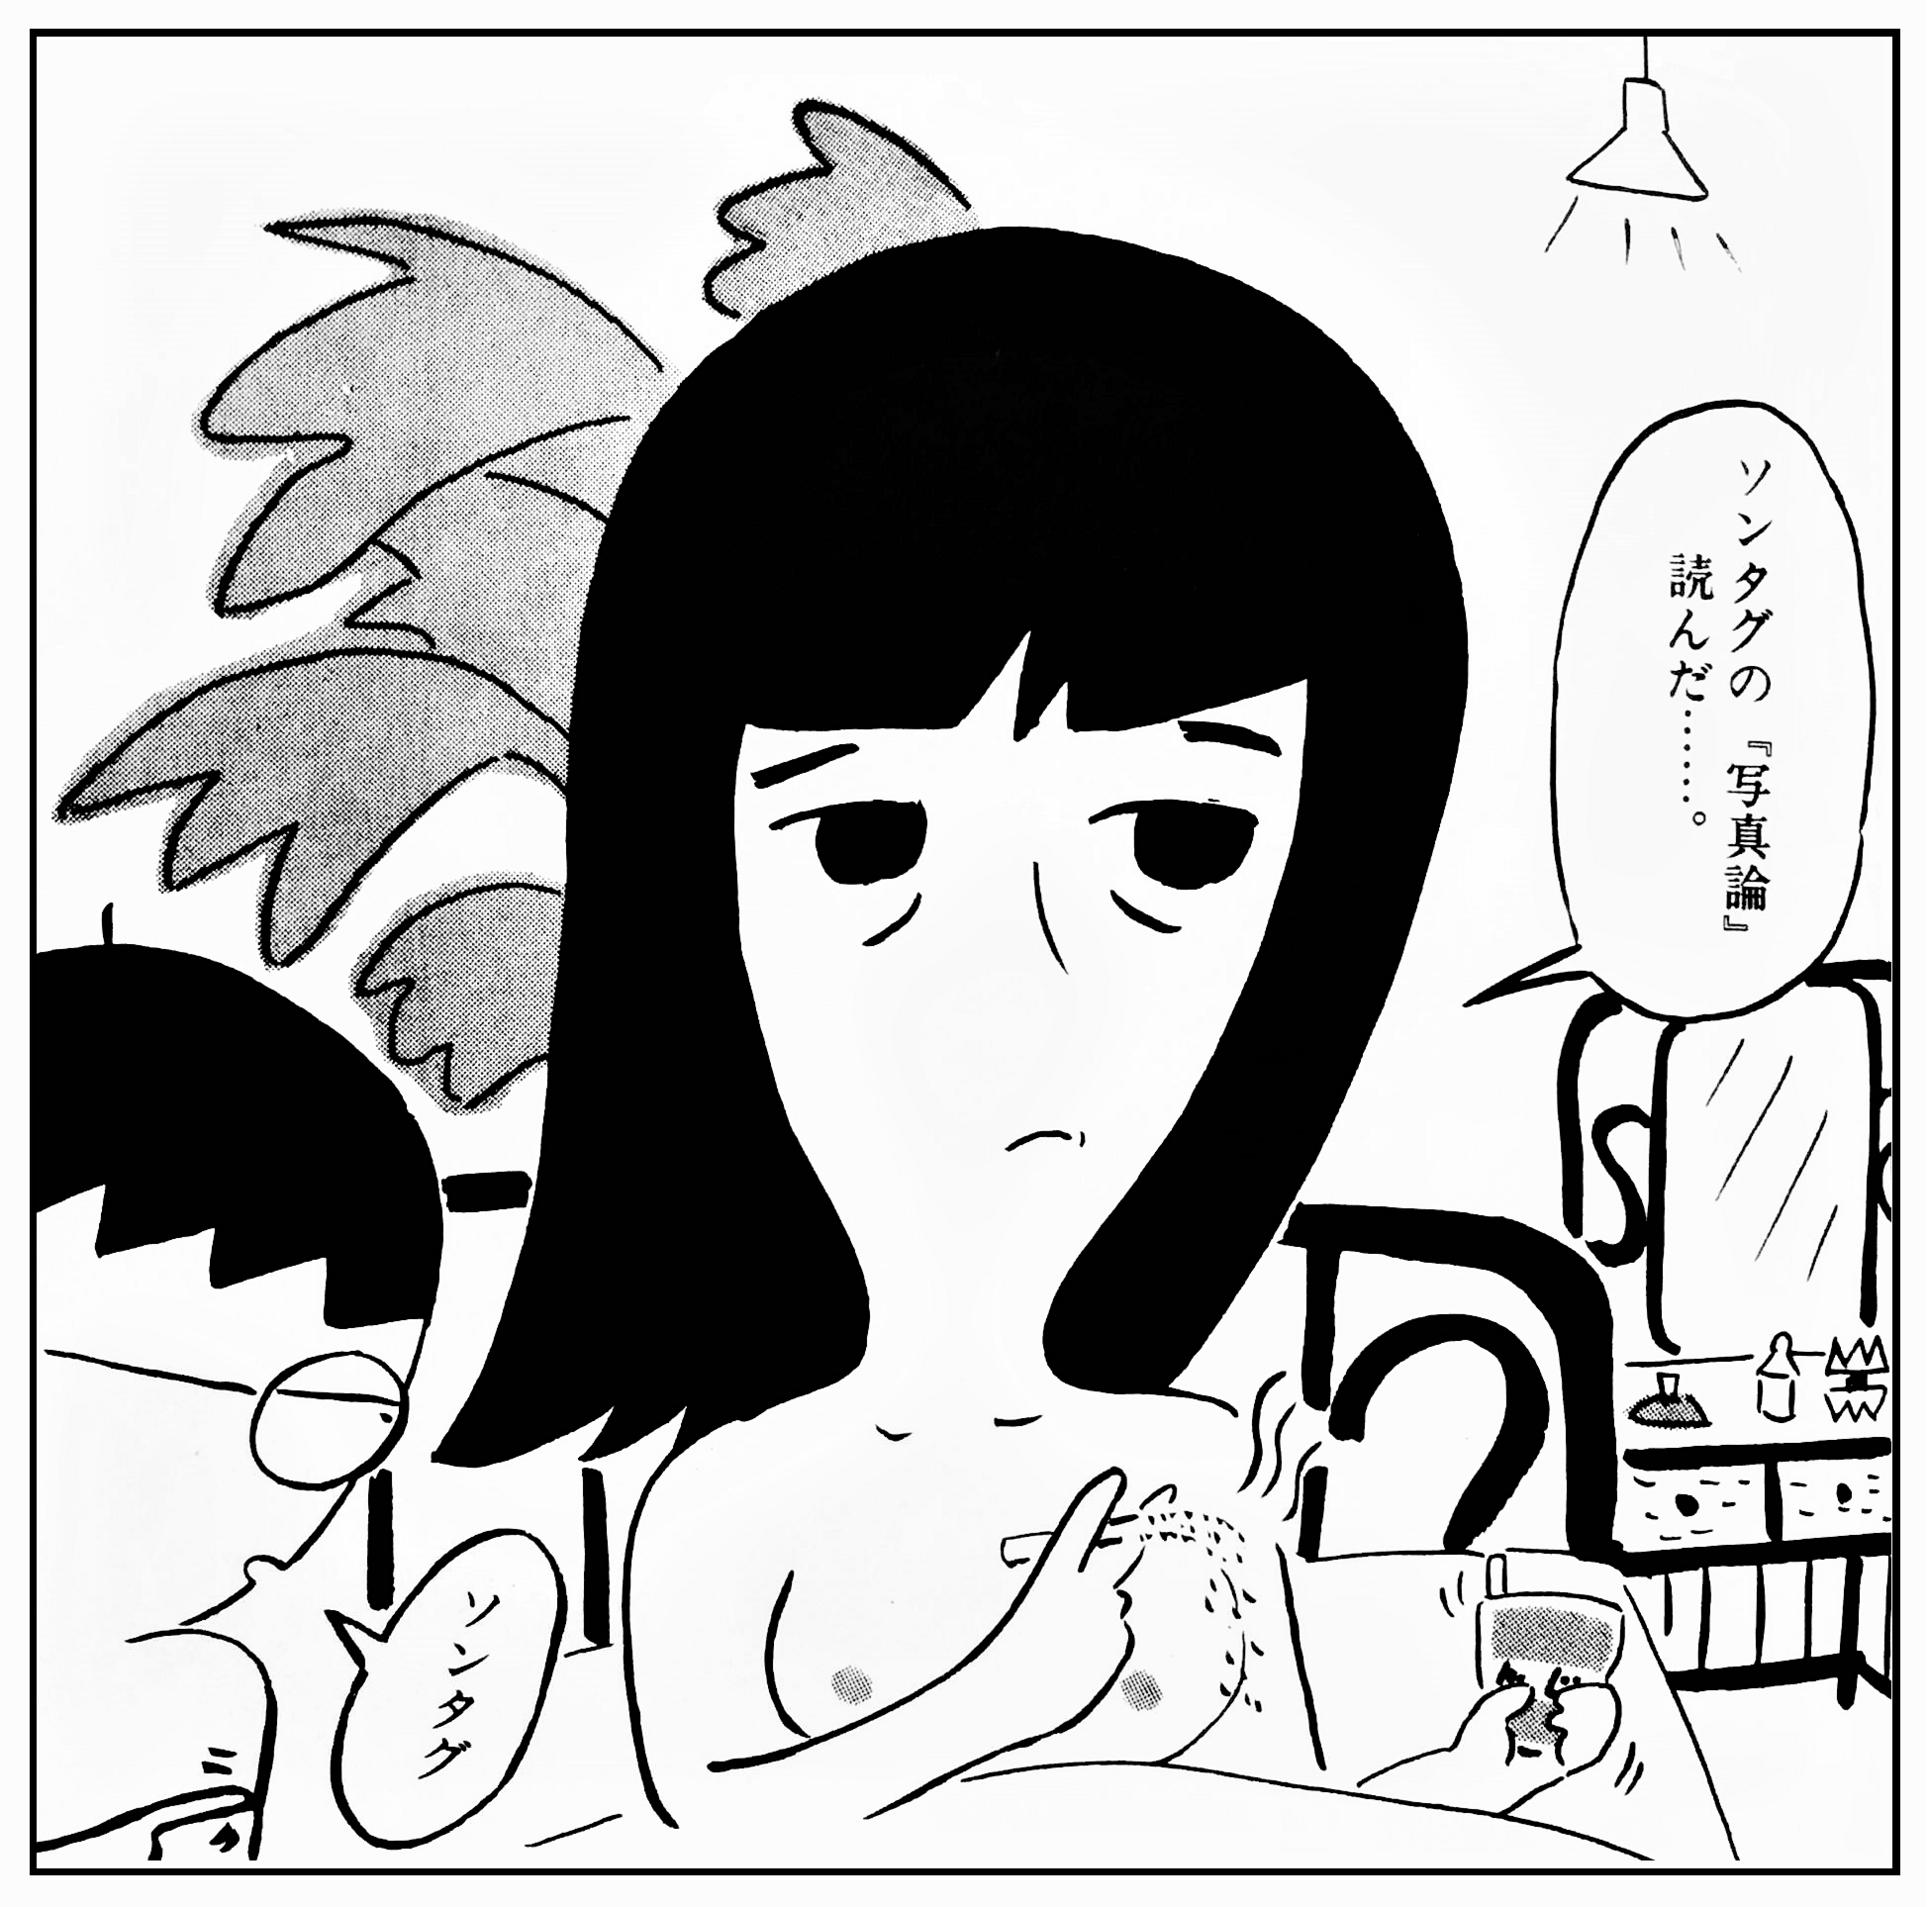 f:id:kougasetumei:20180423235744p:image:w450